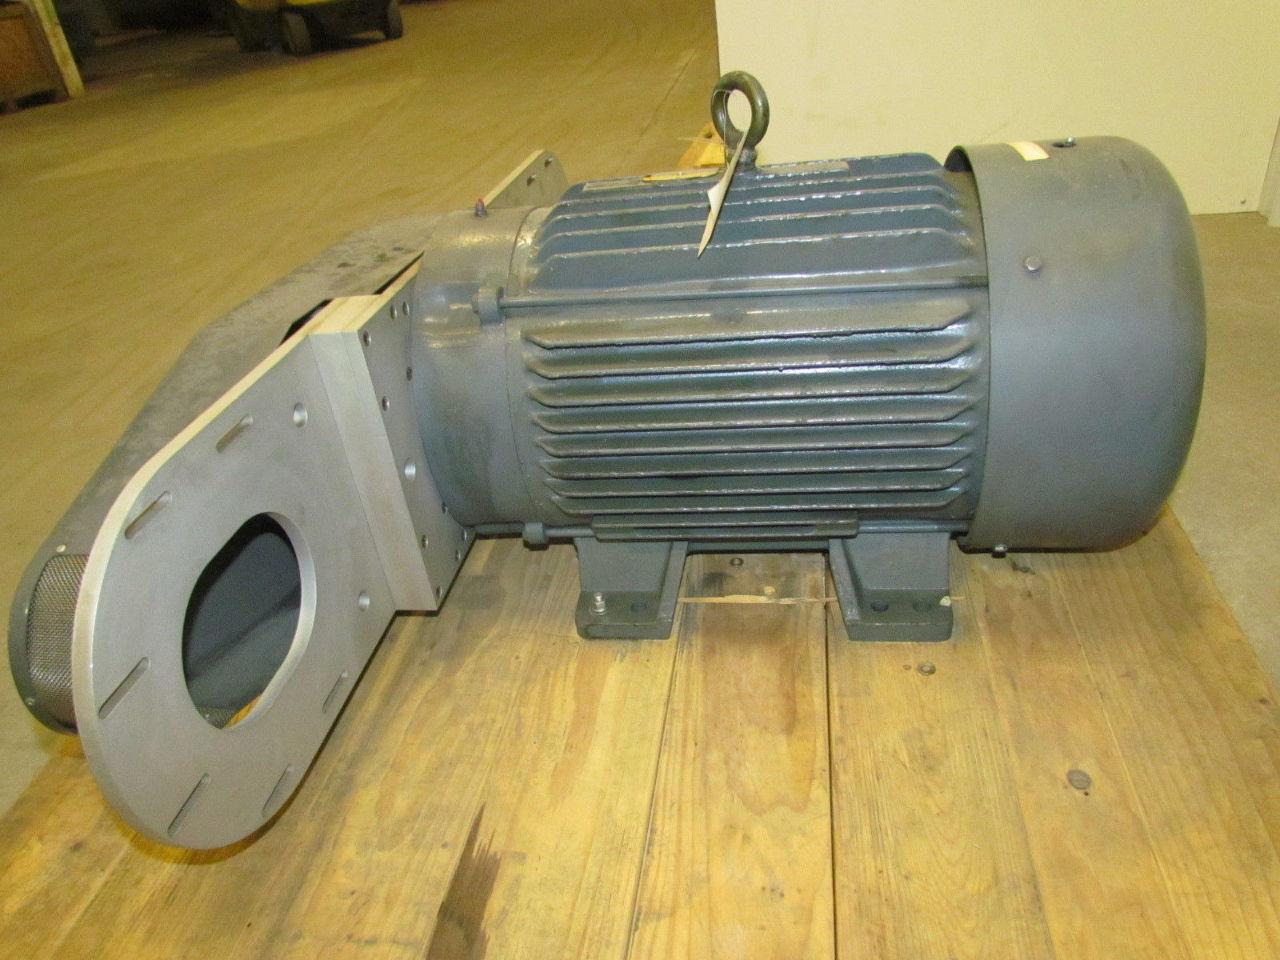 Air Systems Blowers : Sonic air systems dual centrifugal blower hp baldor